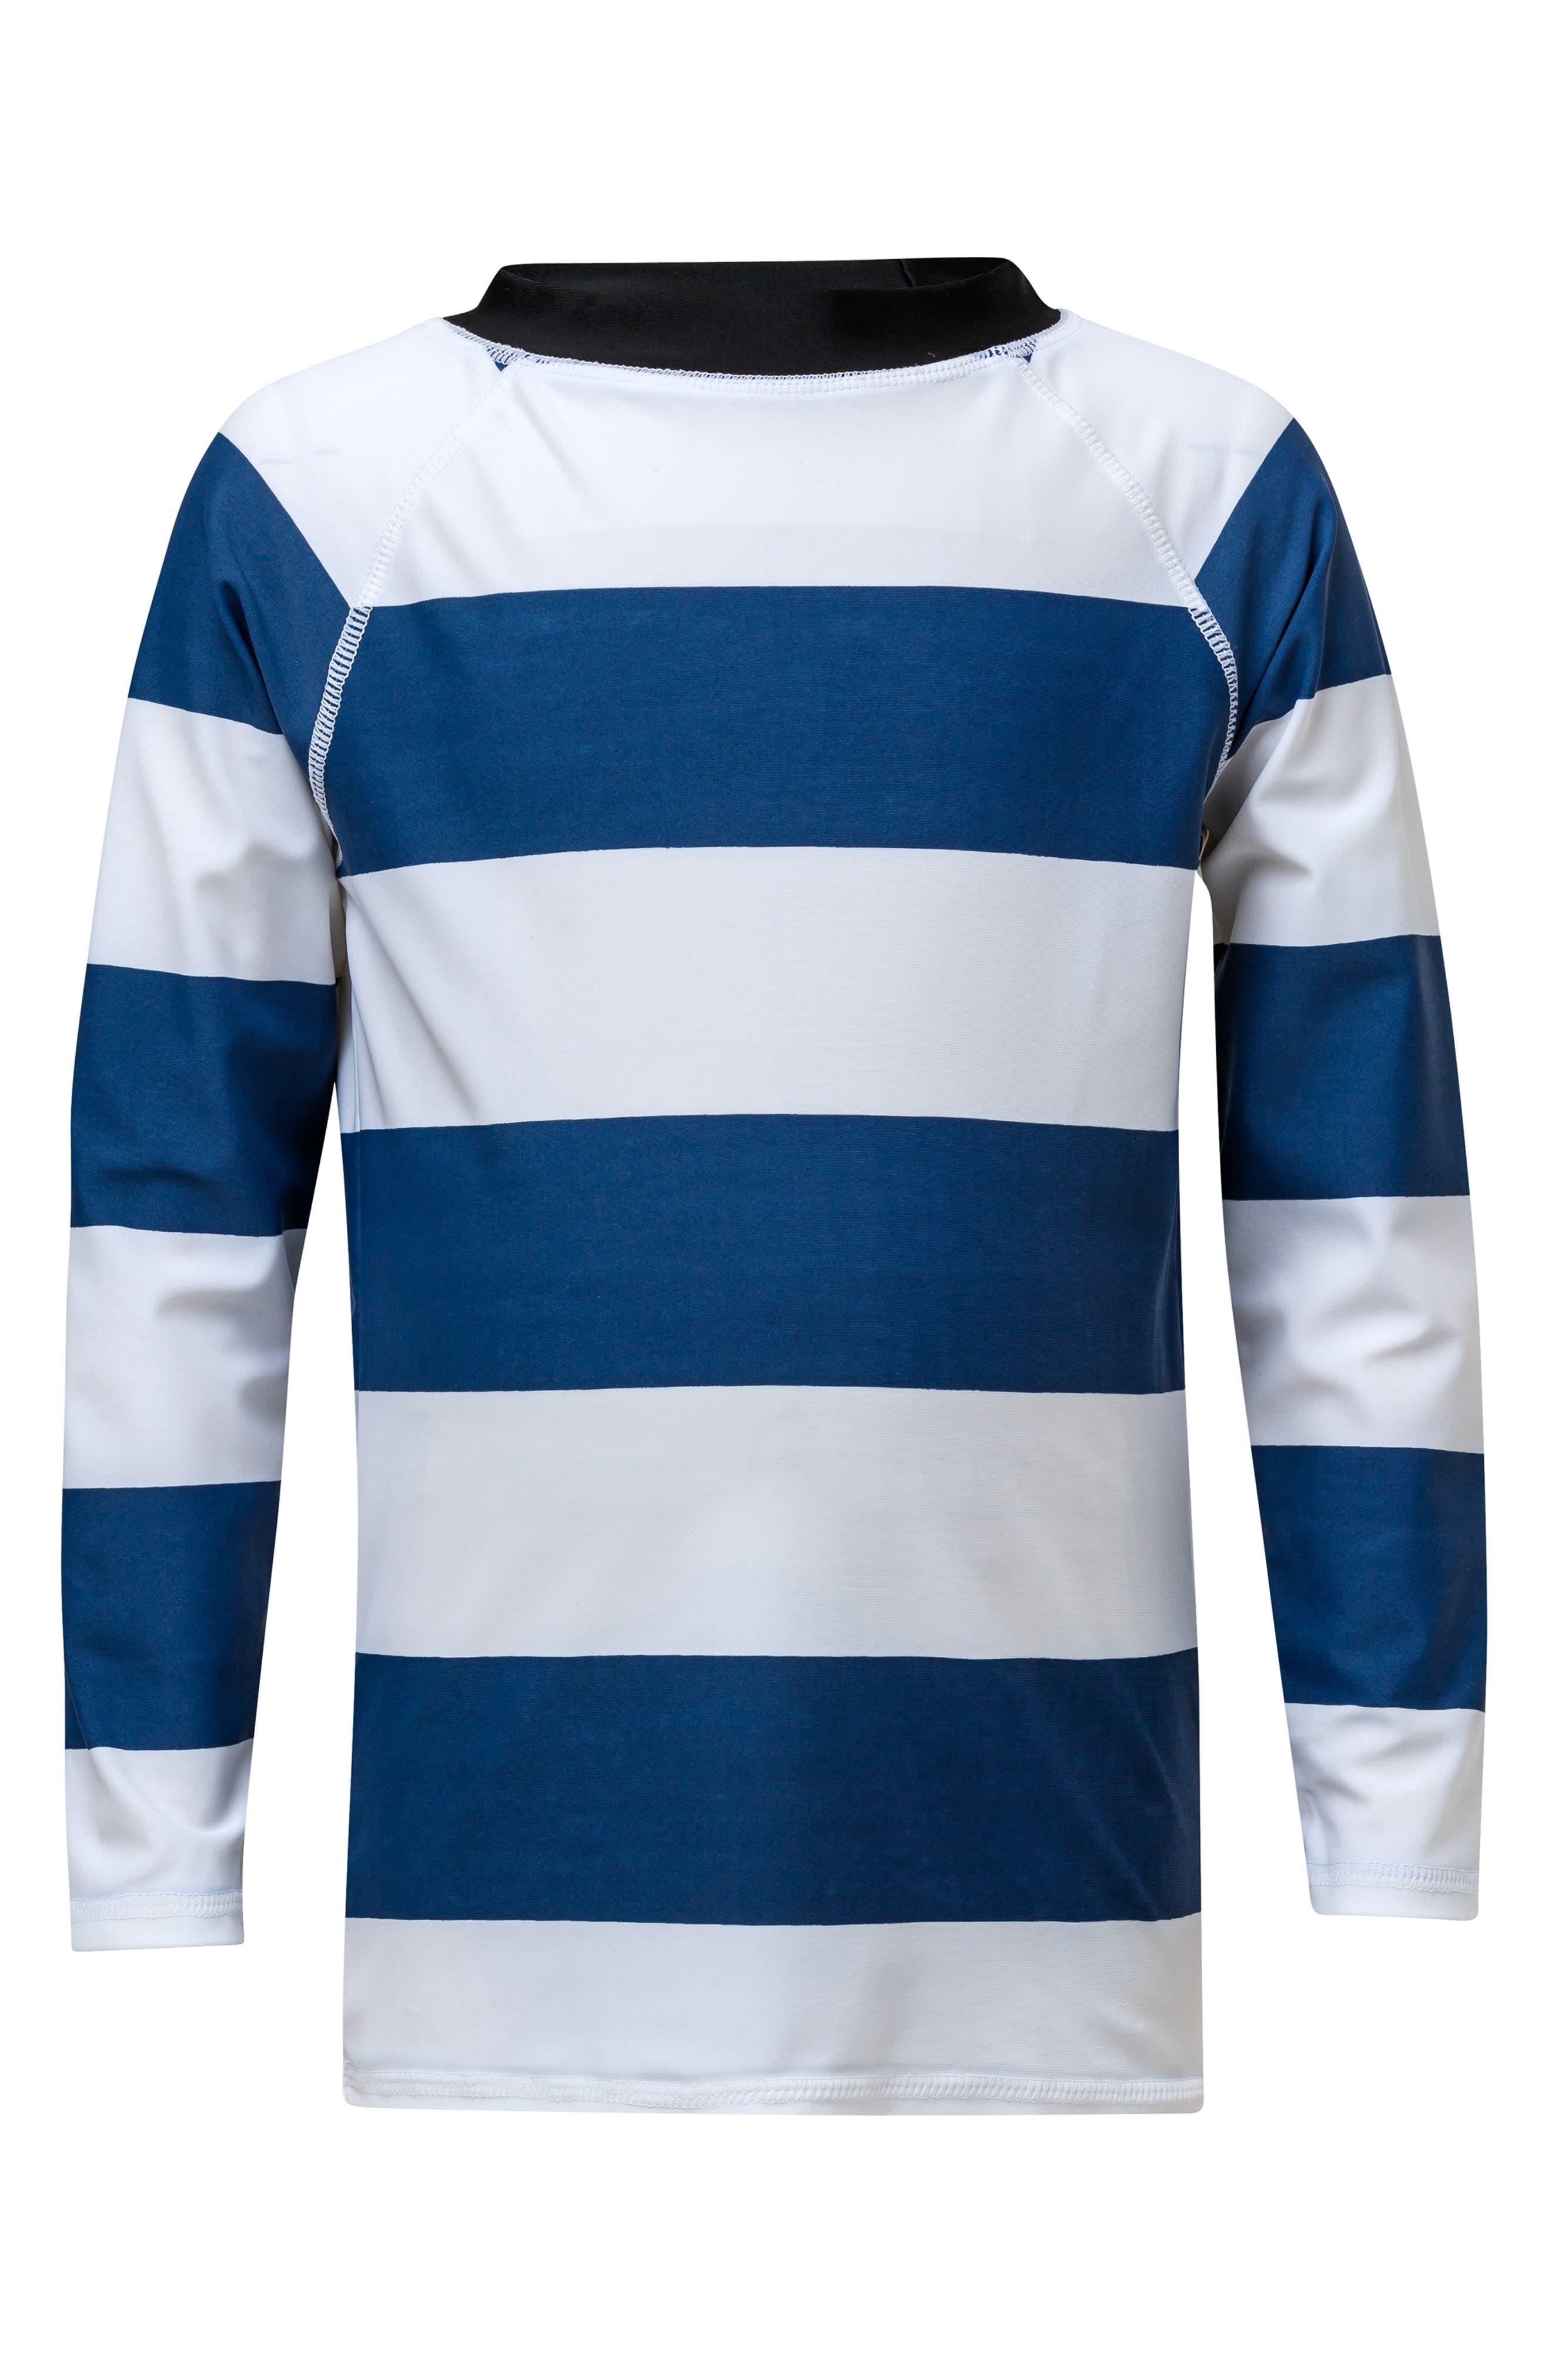 Rugby Stripe Rashguard,                             Main thumbnail 1, color,                             DENIM BLUE WHITE